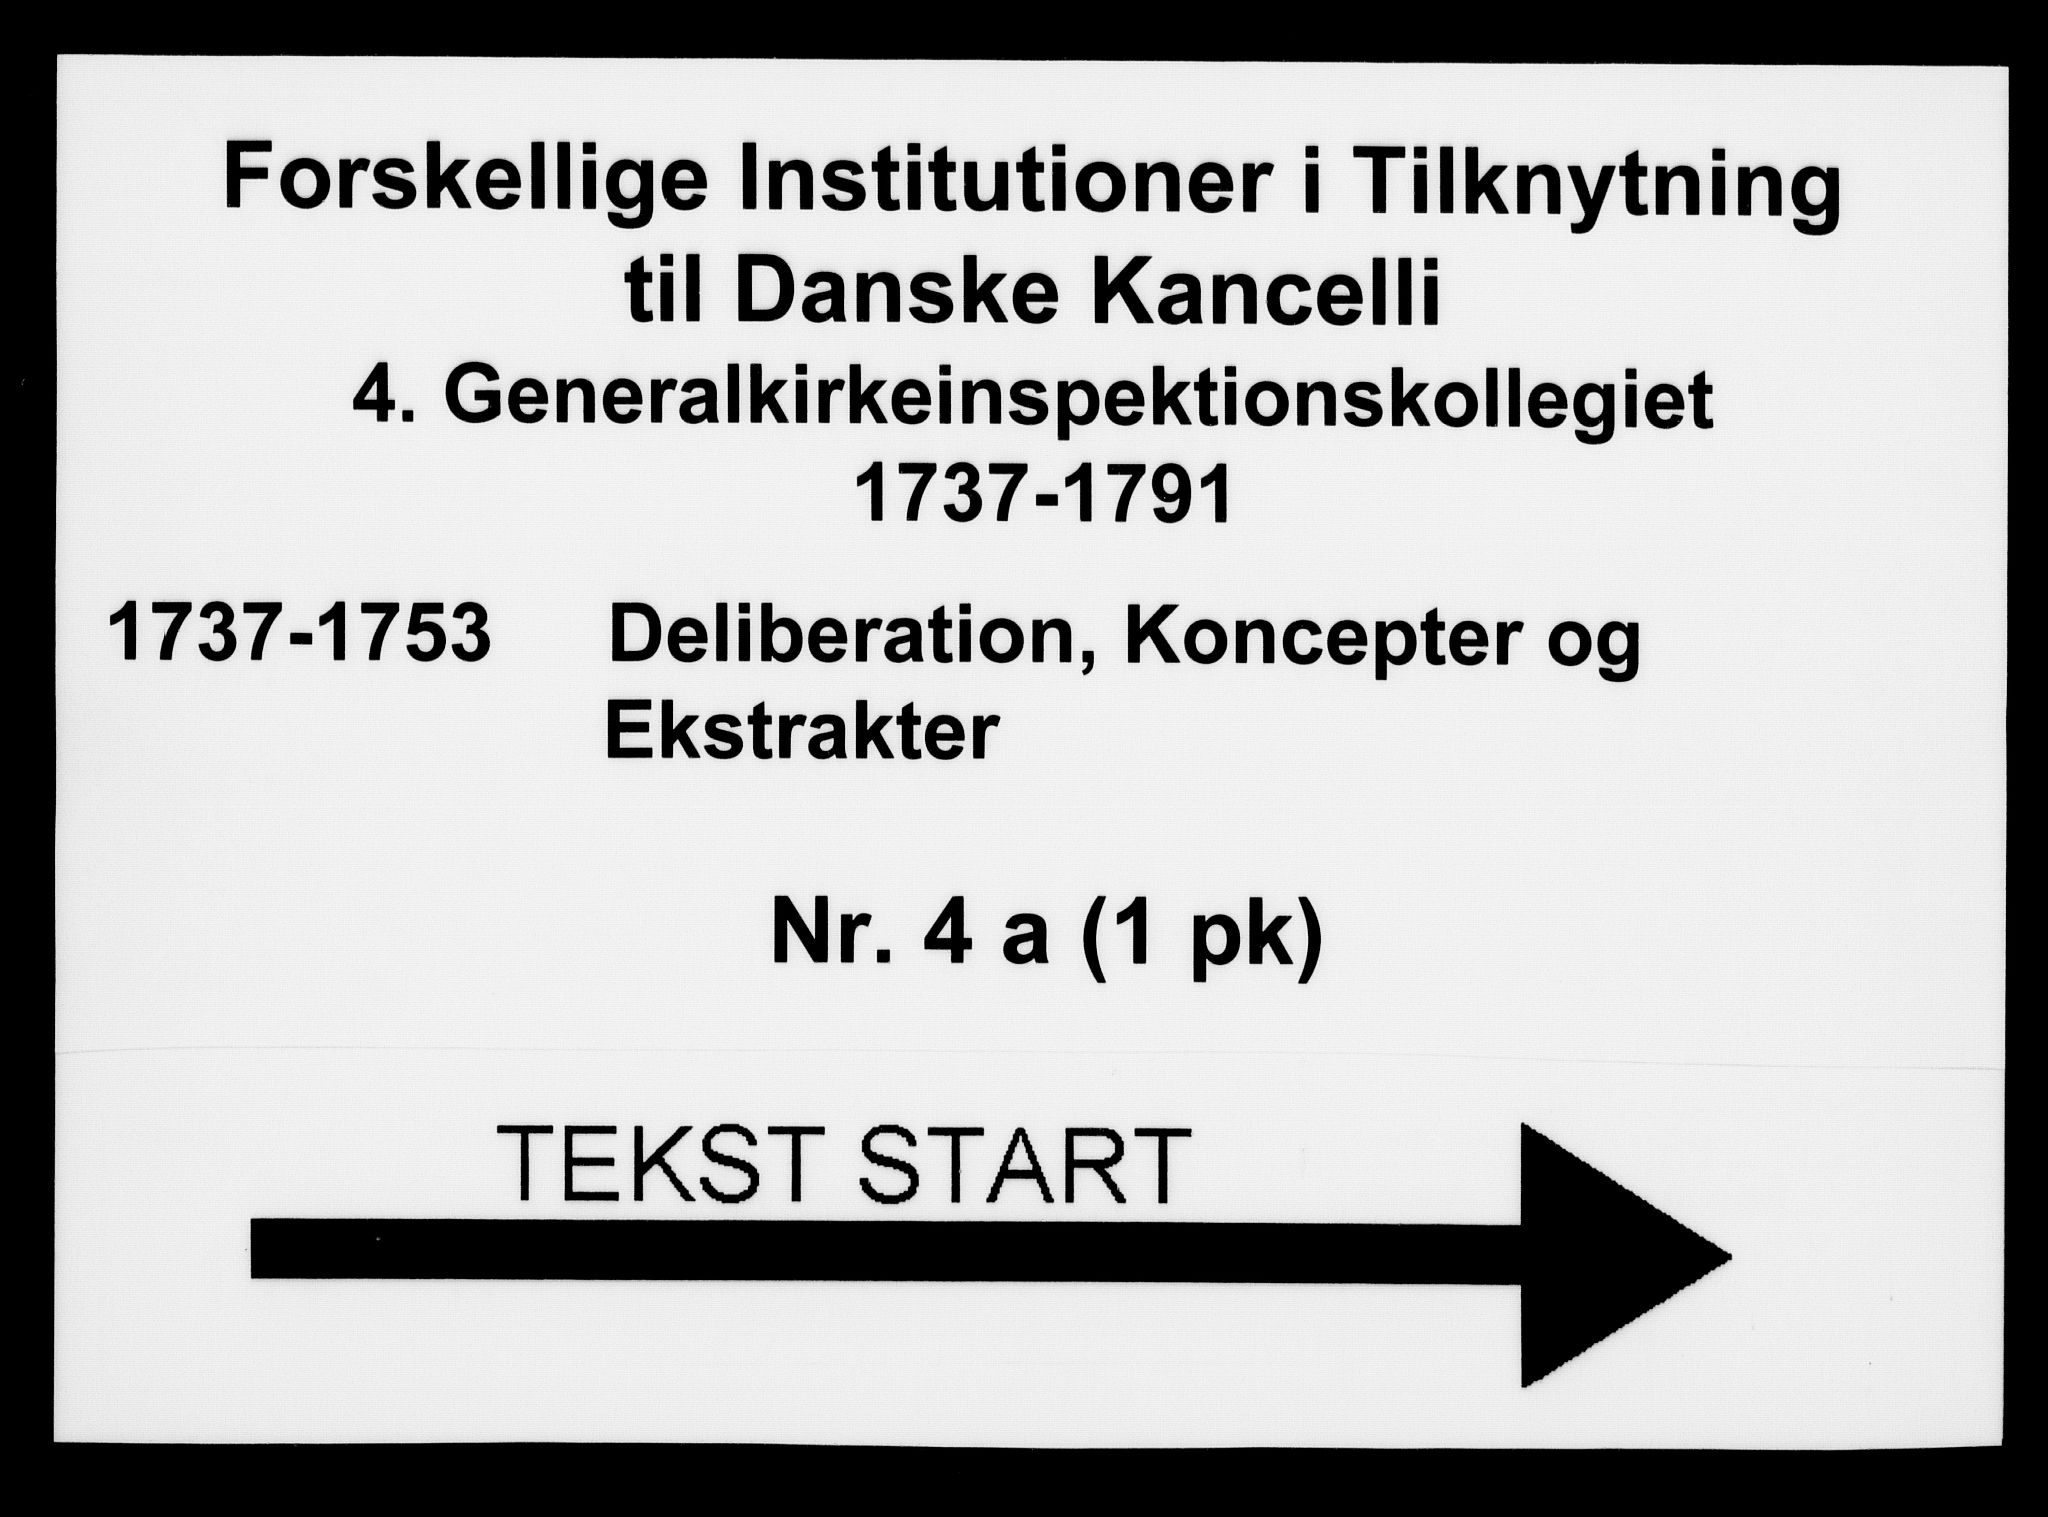 DRA, Generalkirkeinspektionskollegiet, F4-04/F4-04-01: Deliberation, koncepter og ekstrakter, 1737-1753